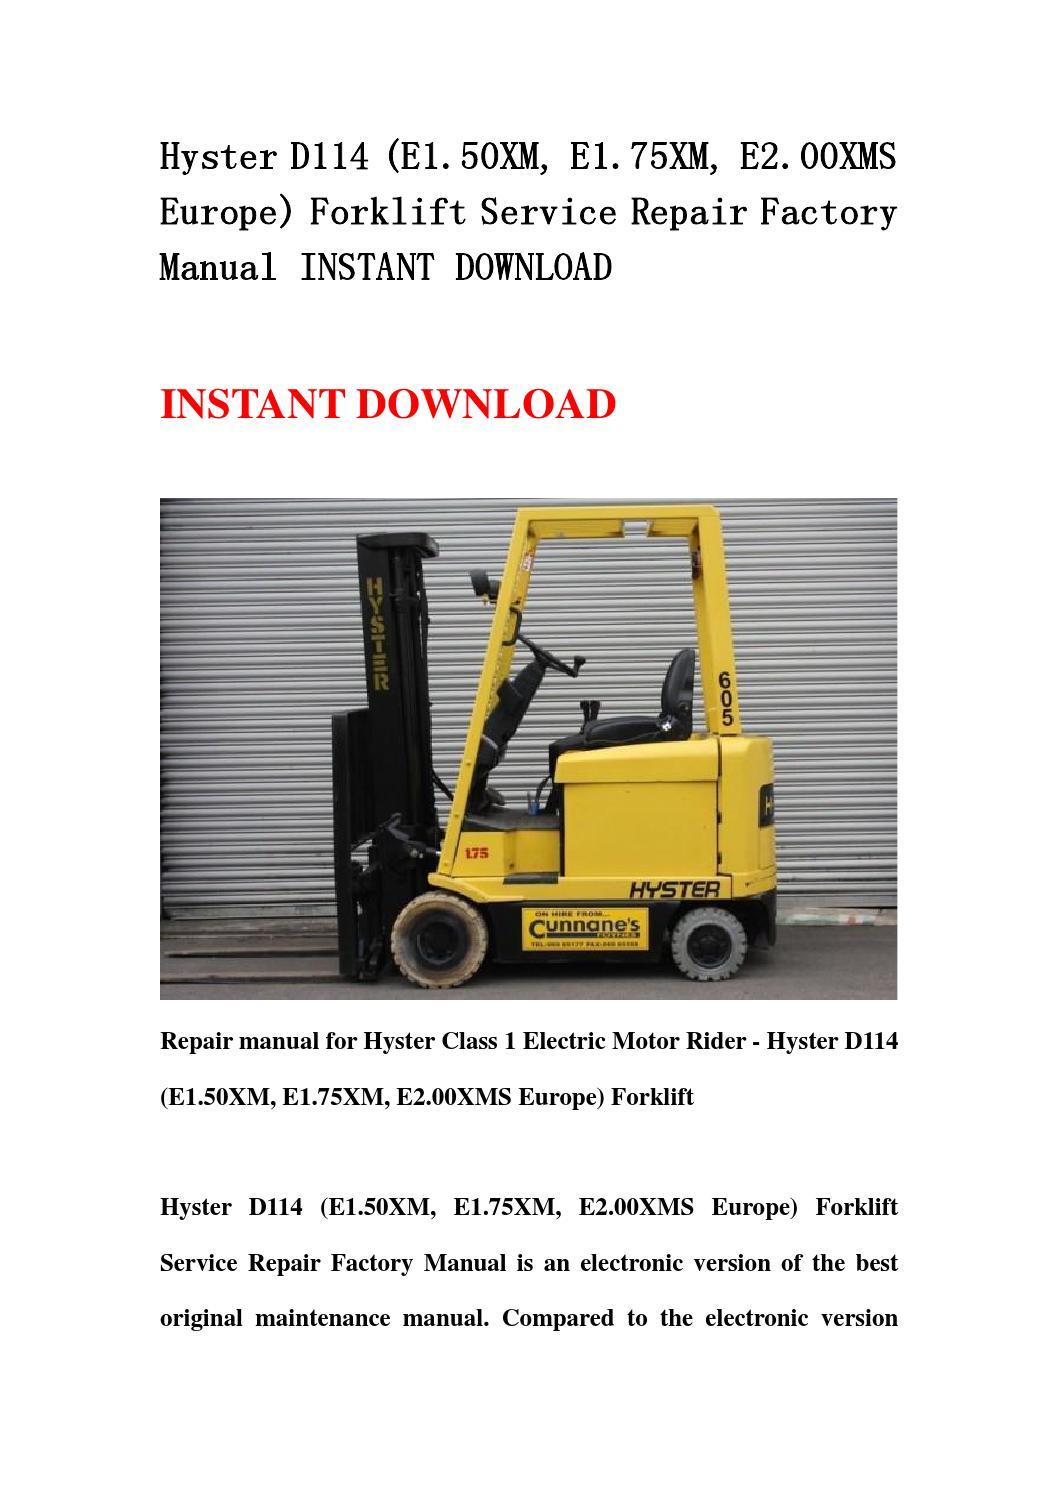 Hyster D114  E1 50xm  E1 75xm  E2 00xms Europe  Forklift